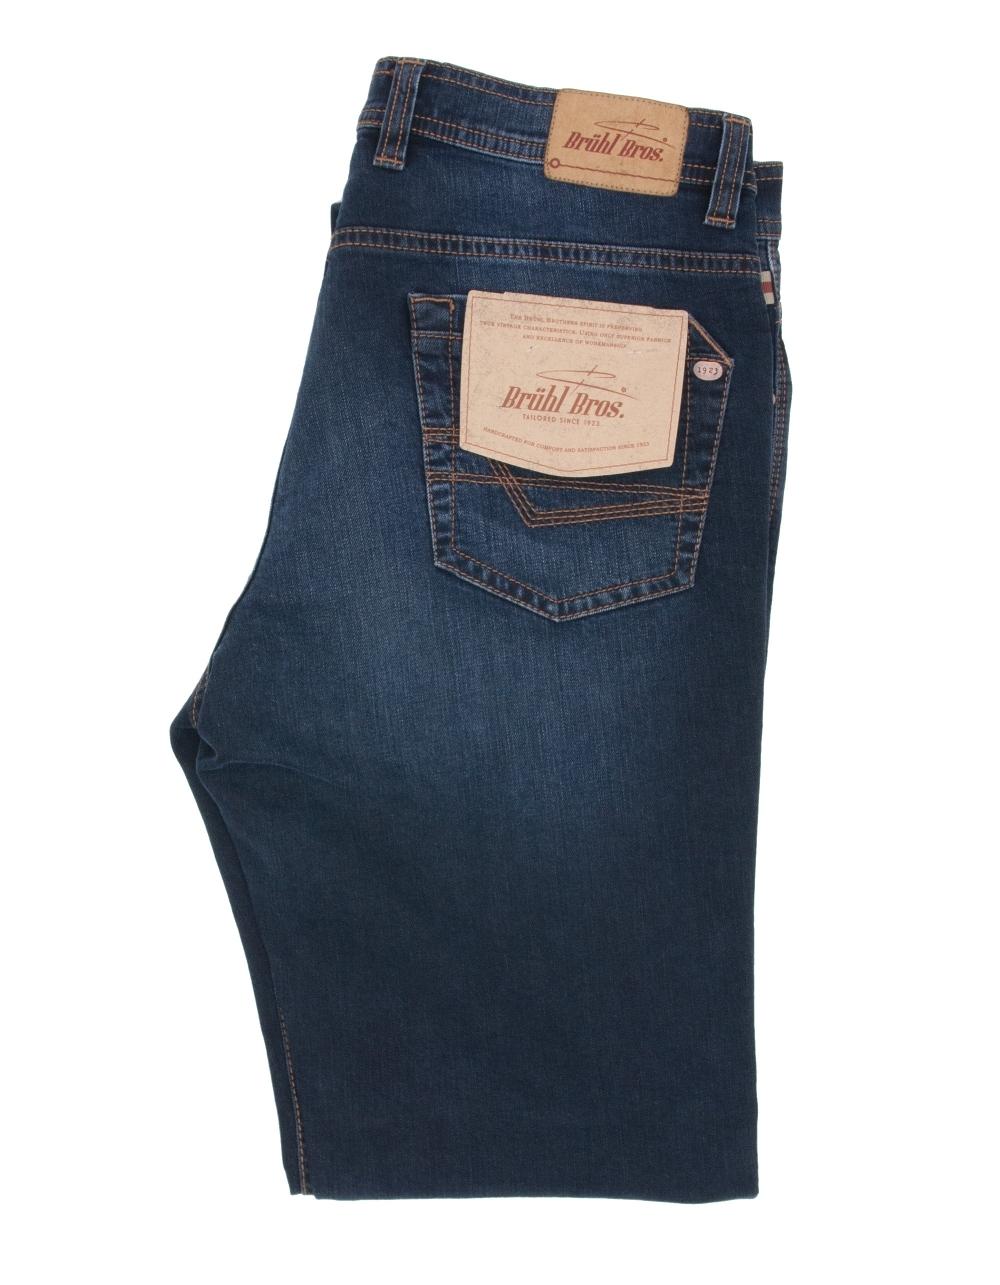 Bruhl Jeans